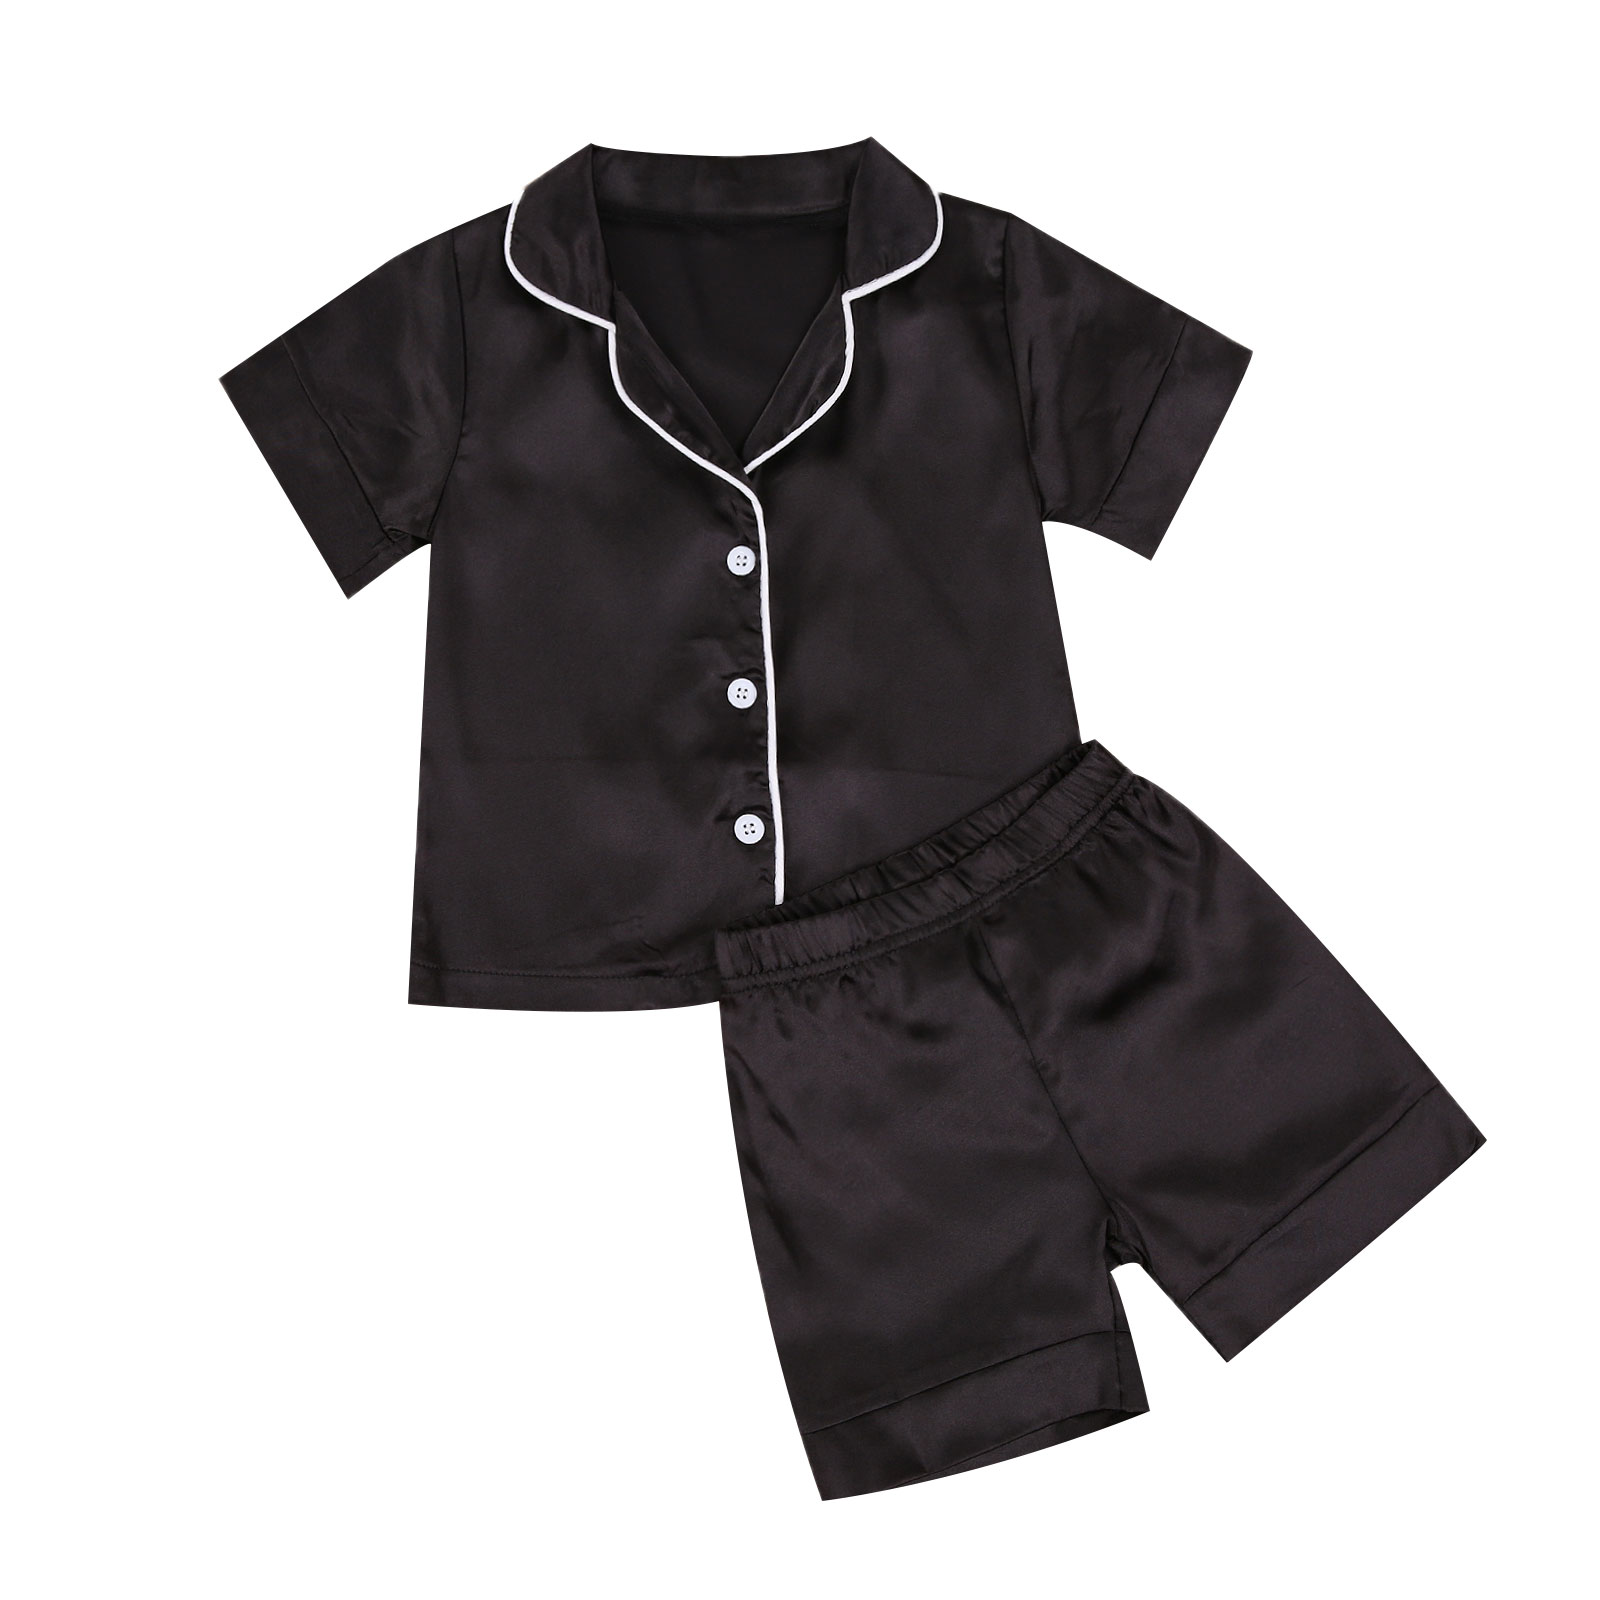 Children Sleepwear Shorts Pajamas-Sets Satin Toddler Baby-Boys Summer Black Infant Solid